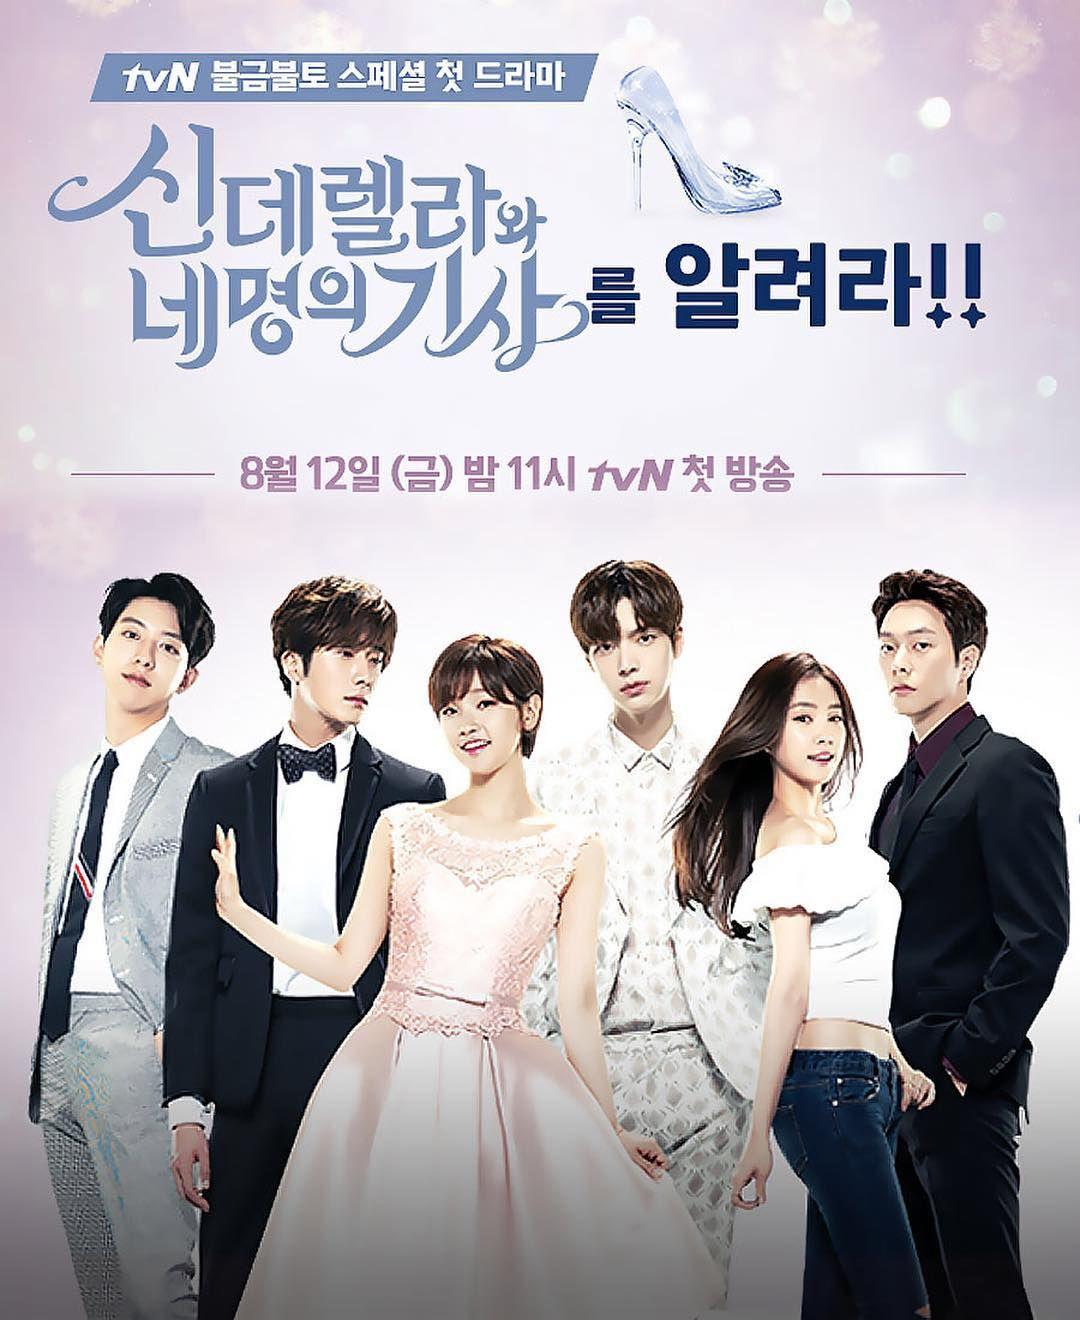 Sinopsis Drama Korea Cinderella And Four Knight : sinopsis, drama, korea, cinderella, knight, Drama..., Cinderella, Knights, Which, Would, Pick!💖, Dramen,, Filme, Serien,, Drama